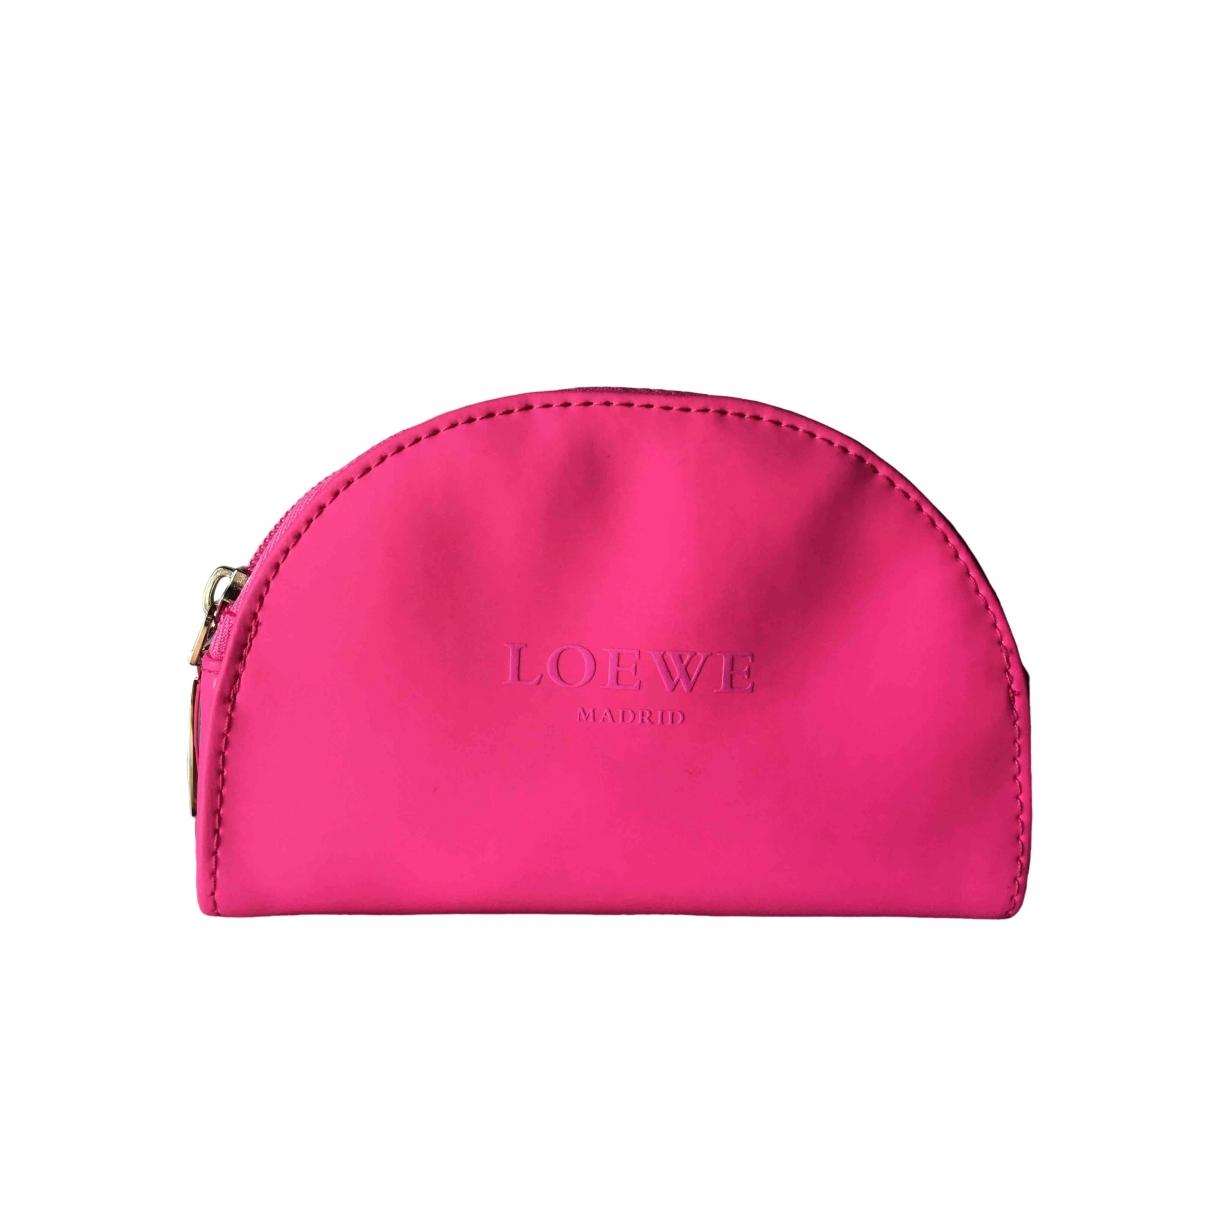 Loewe - Sac de voyage   pour femme - rose